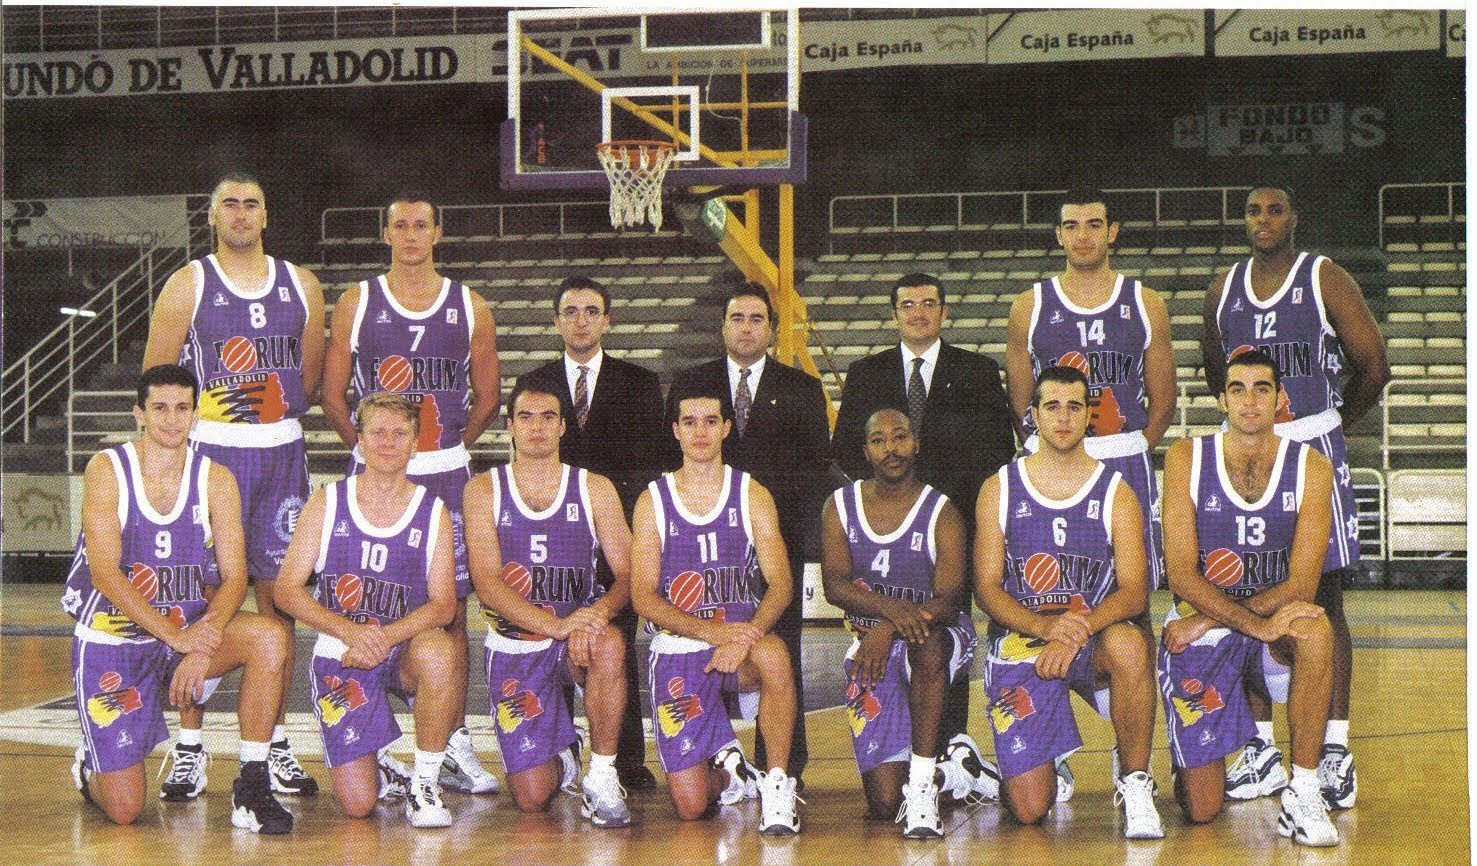 FORUM VALLADOLID 1997-1998. Liga ACB